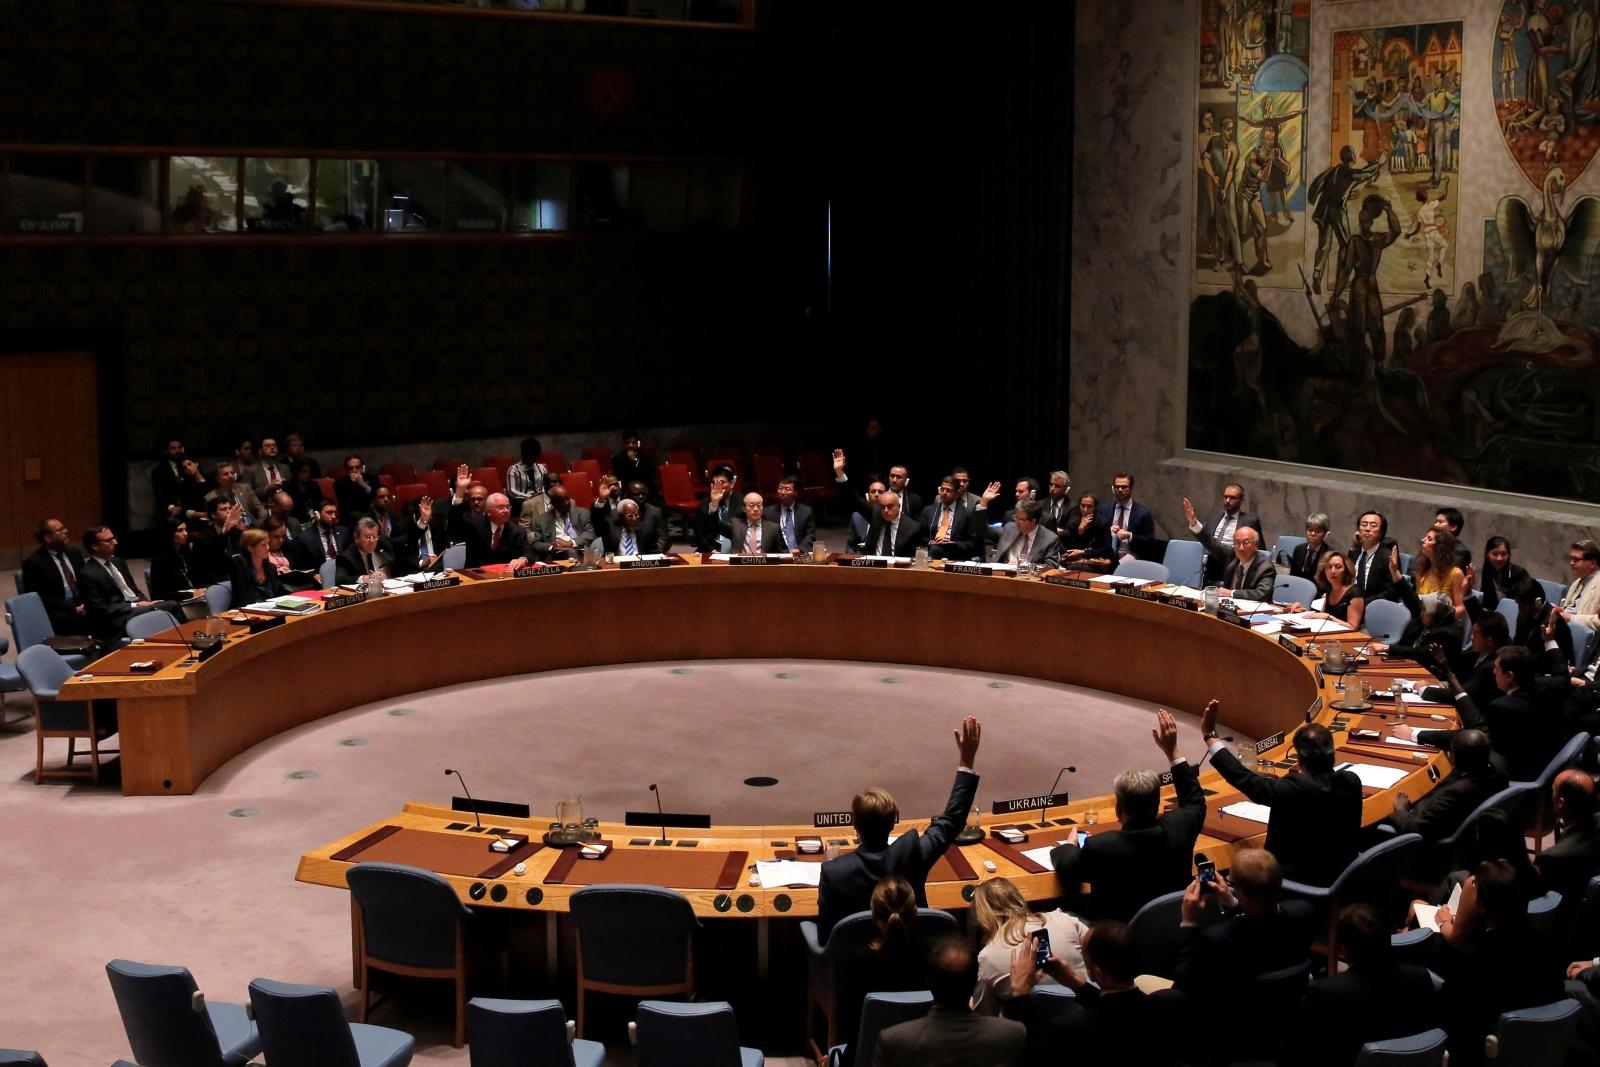 UN Security Council Burundi